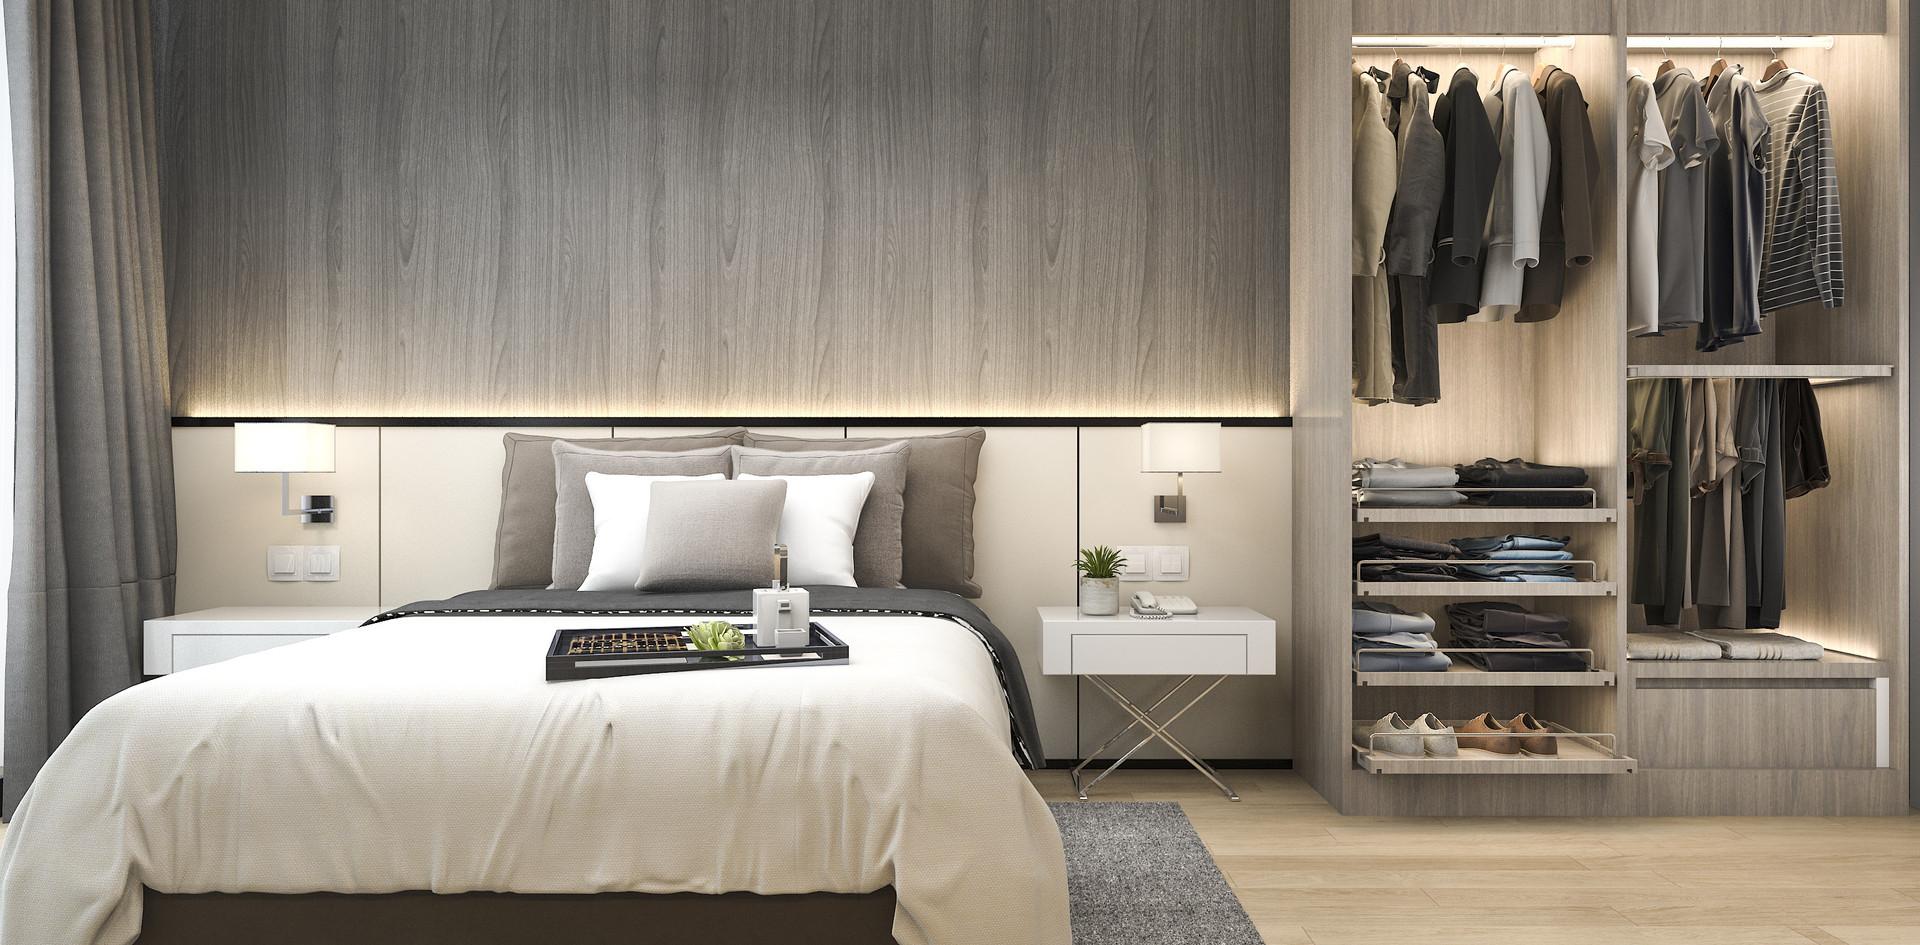 motte bedroom 25.jpeg